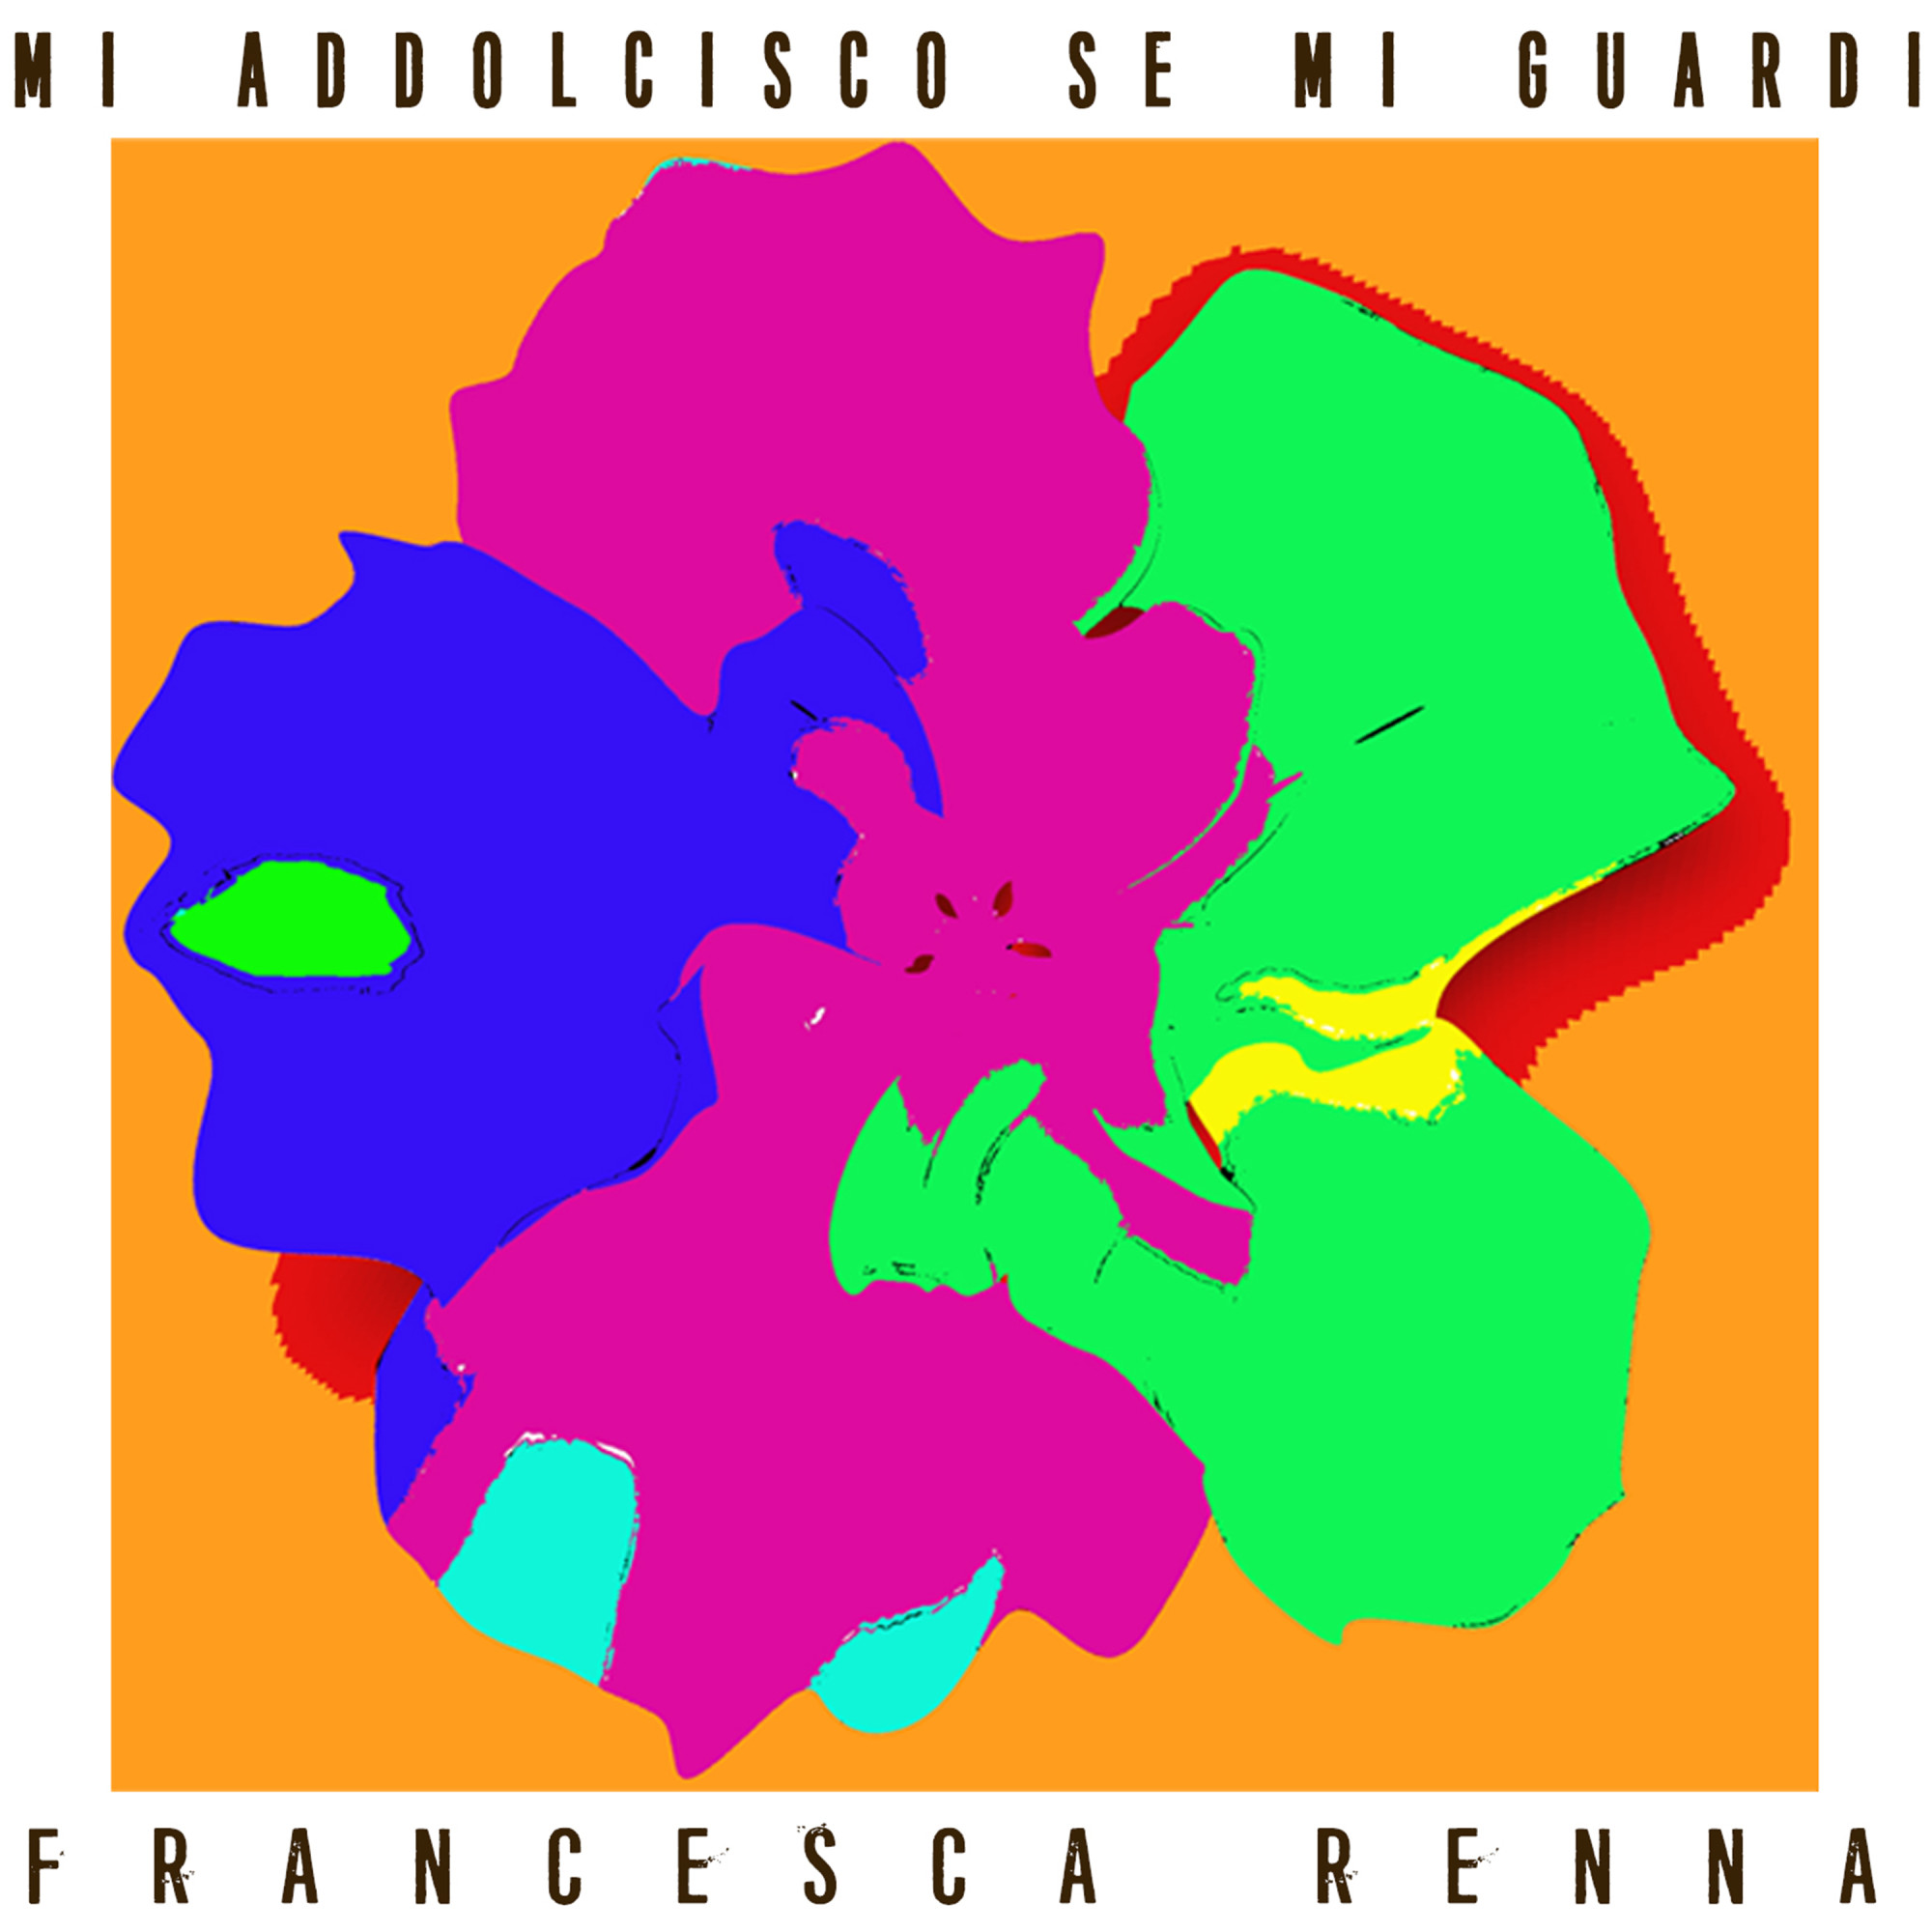 Francesca Renna